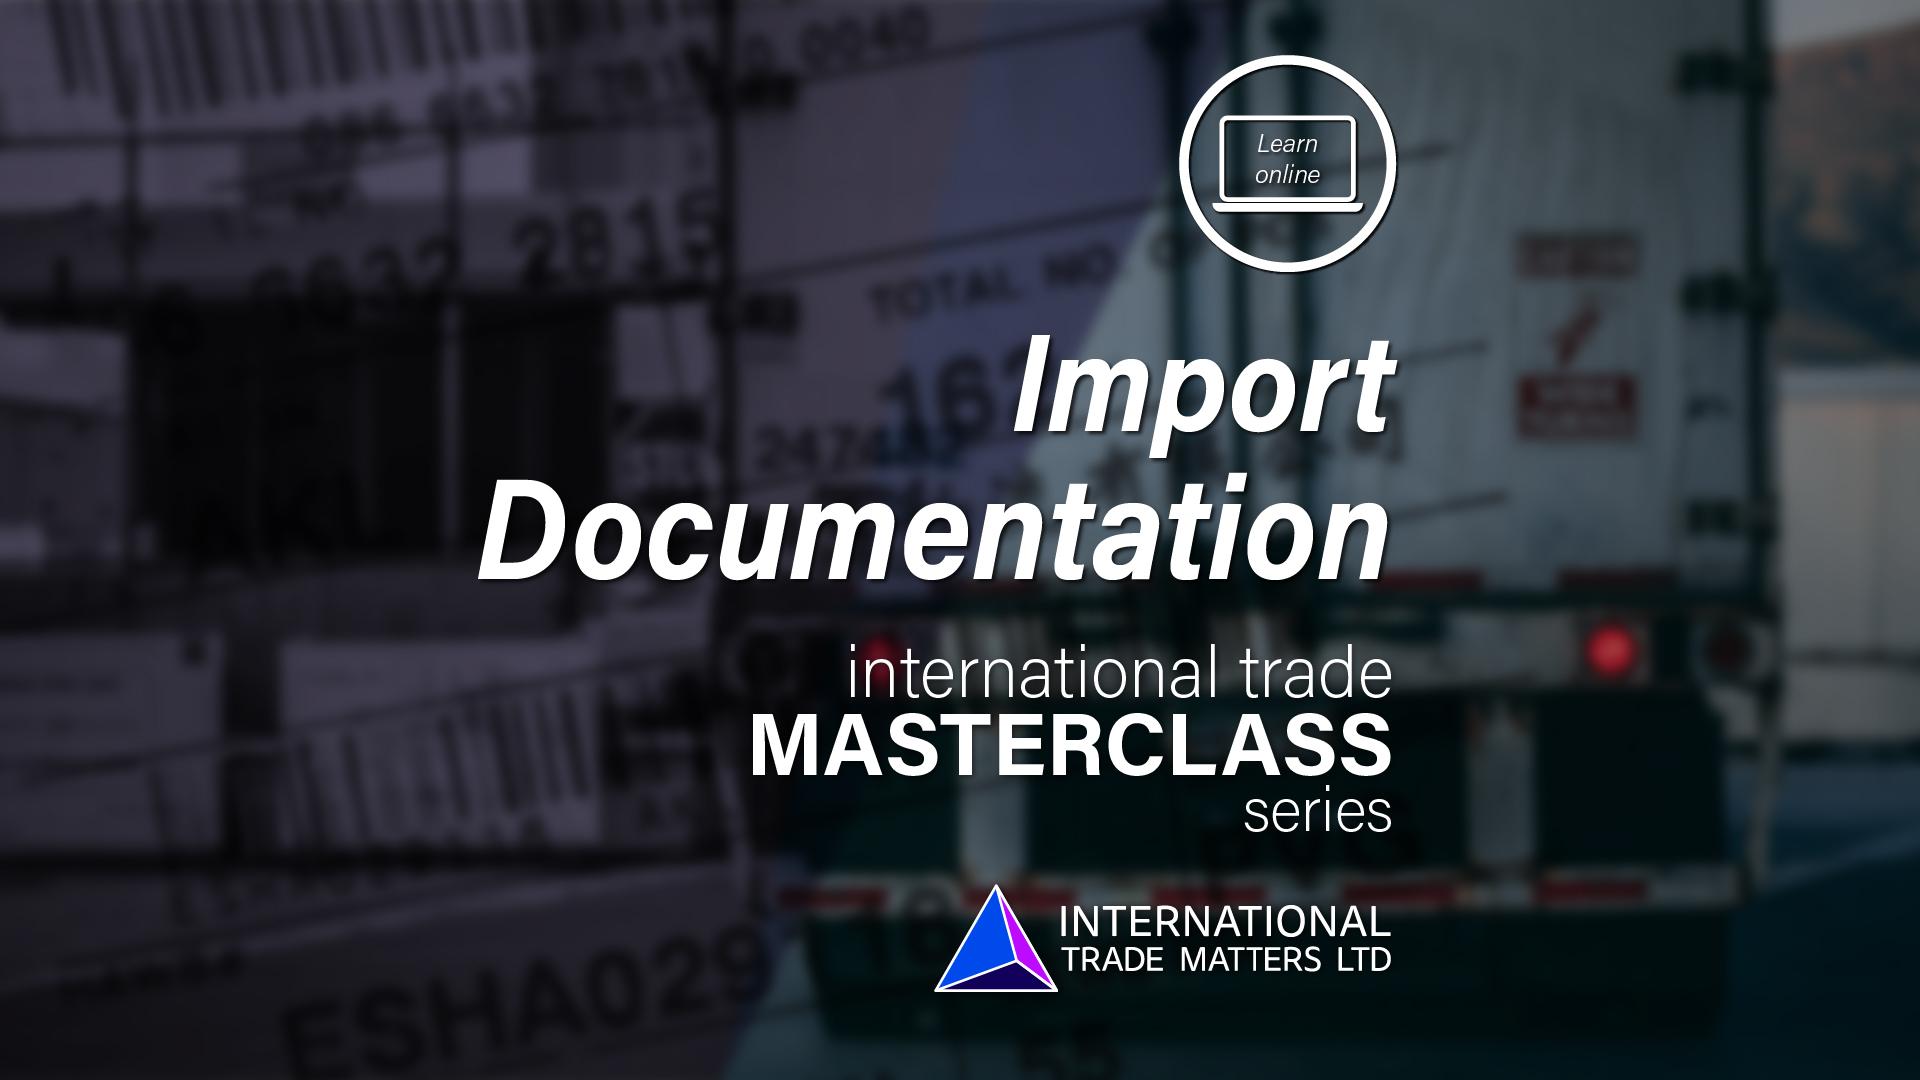 An International Trade Masterclass - Import Documentation